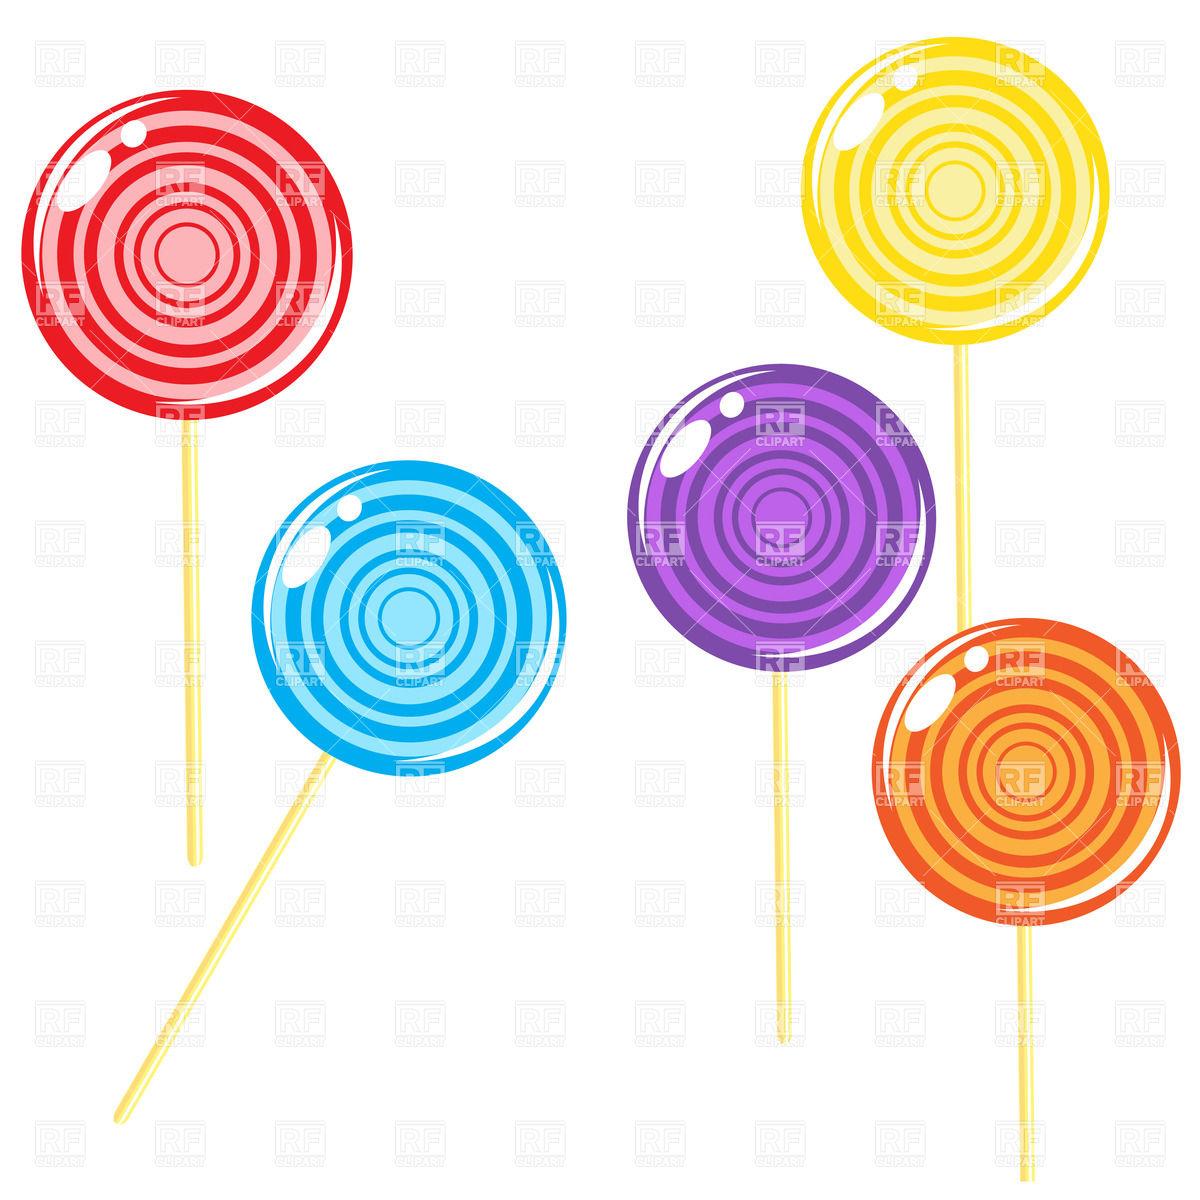 1200x1200 Glossy Round Lollipop Candies Vector Image Vector Artwork Of